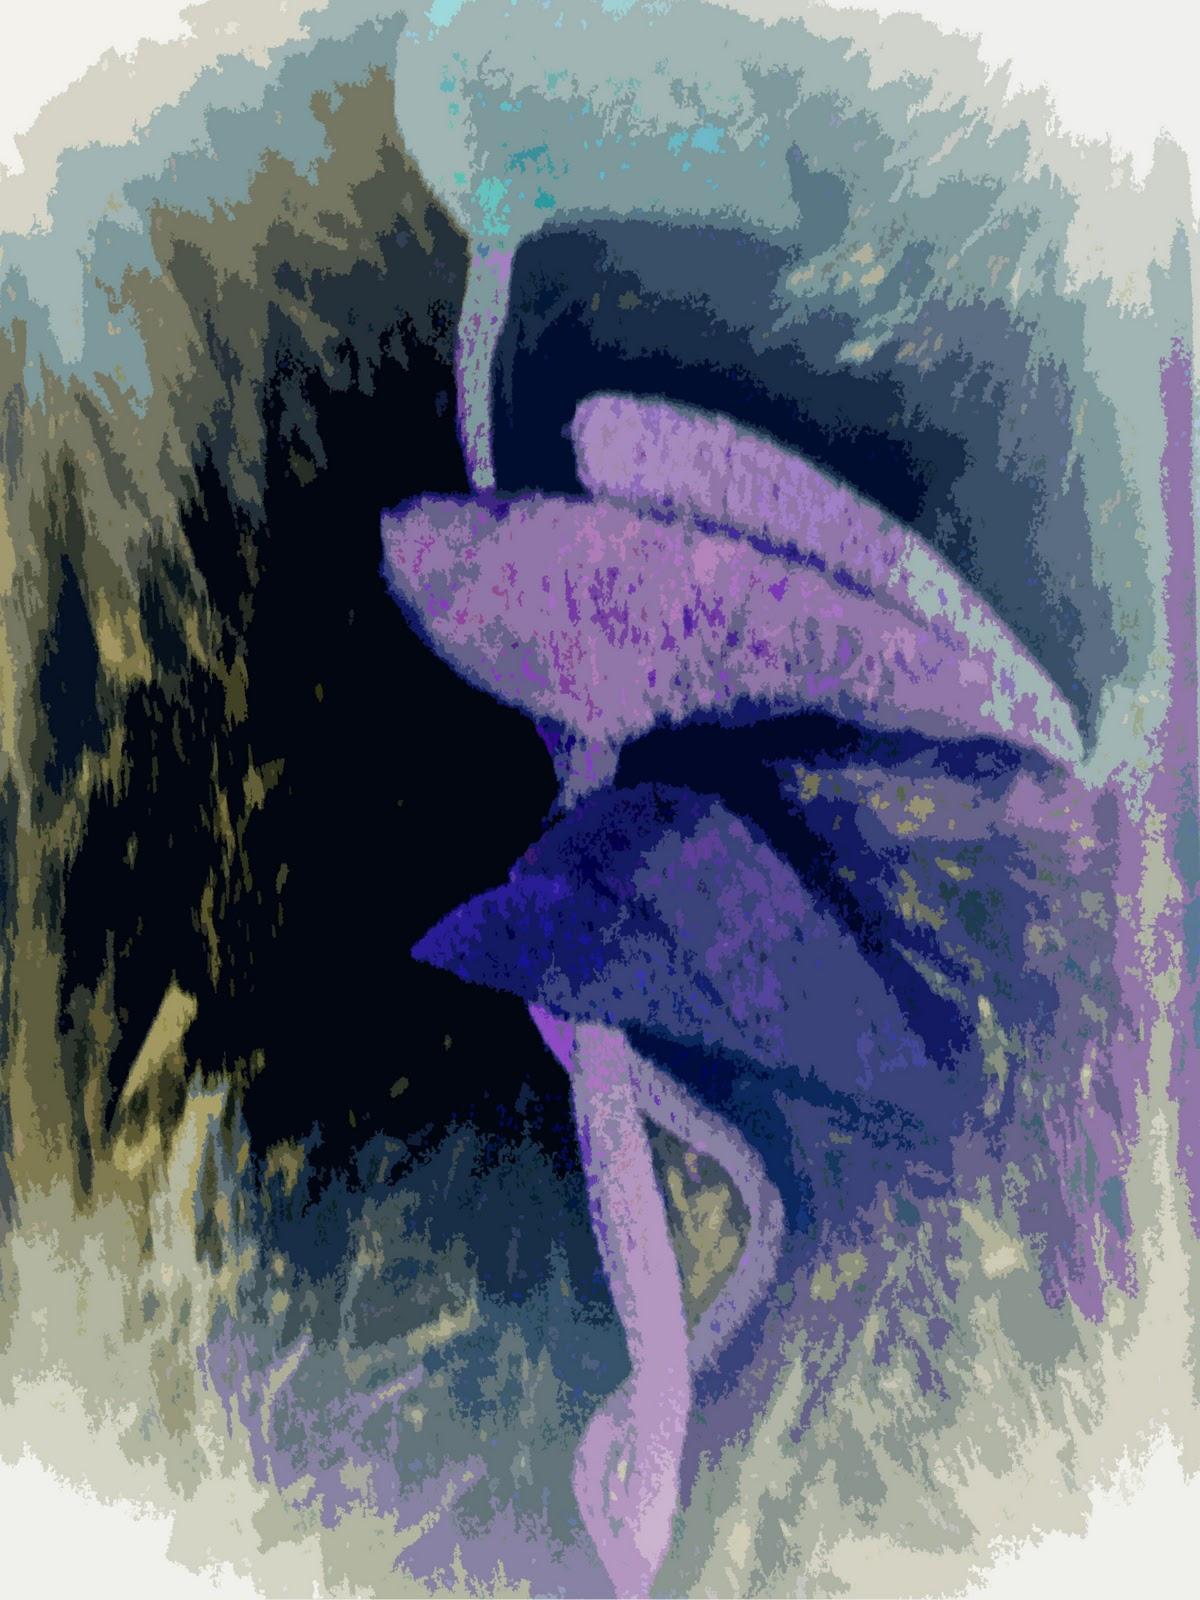 Sebastian Digital Art A Touch Of Frost